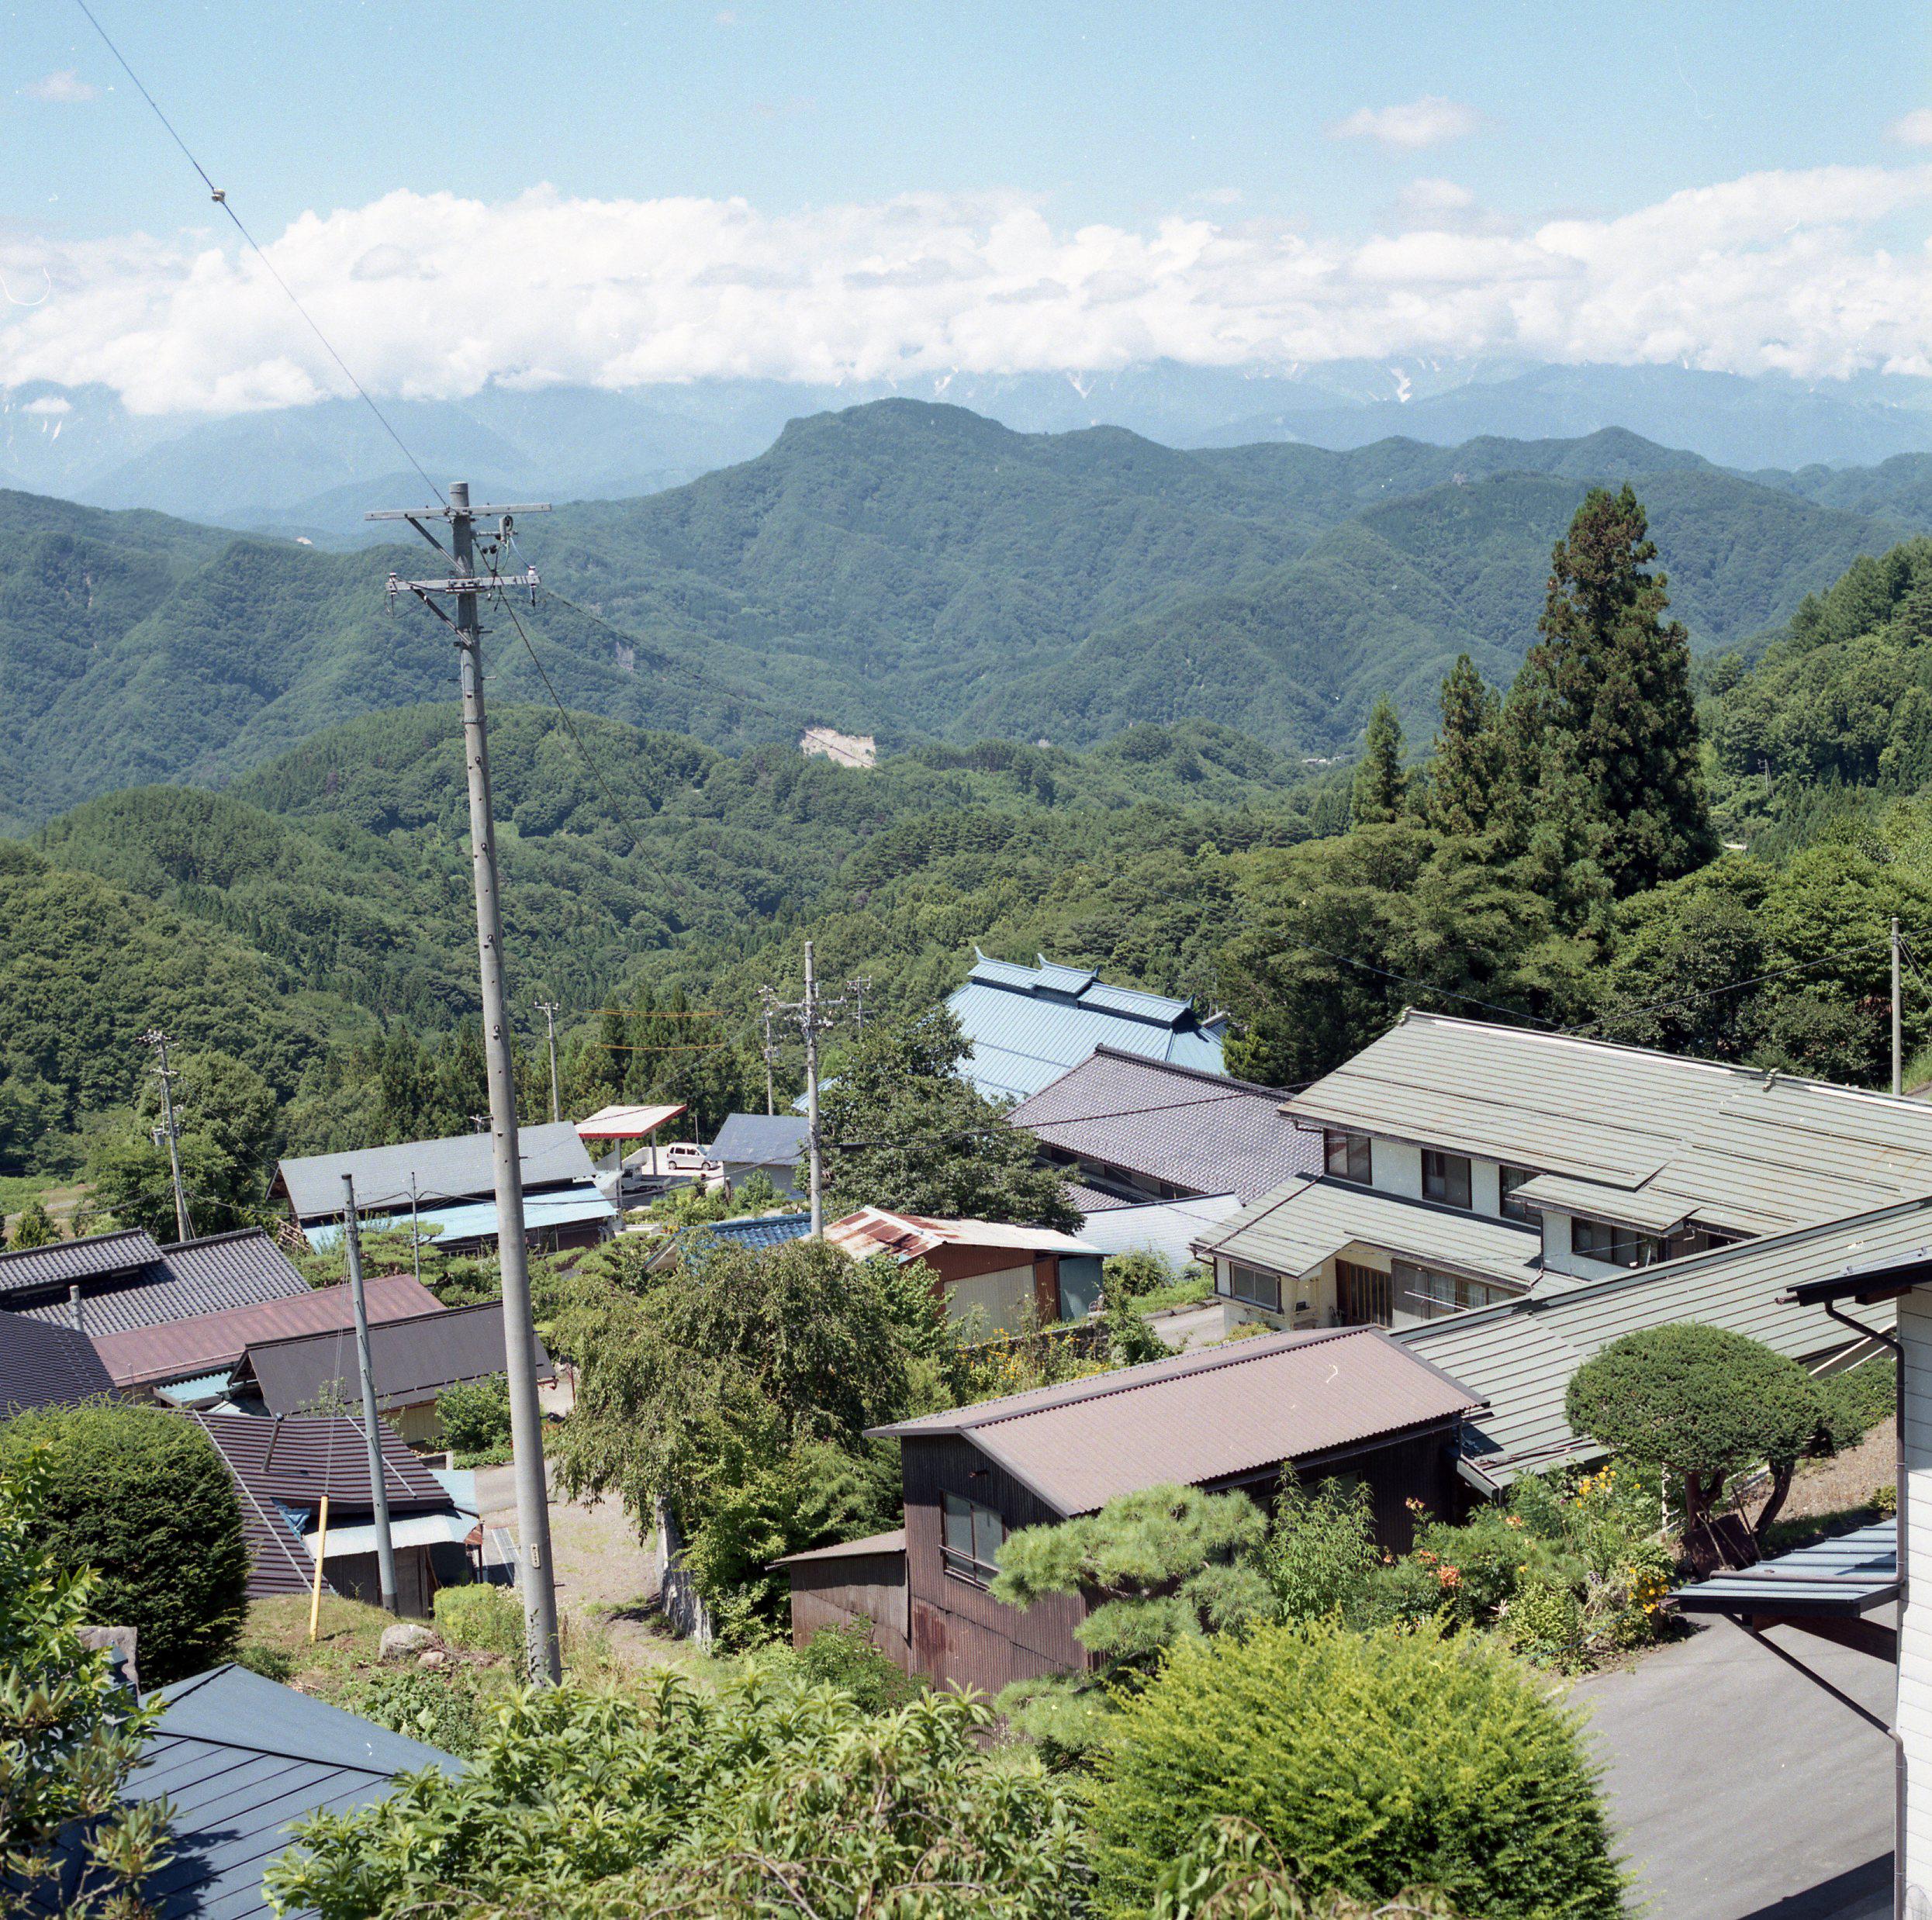 HOUSING_ps_Omi Mura Summer Green 2_007.jpg